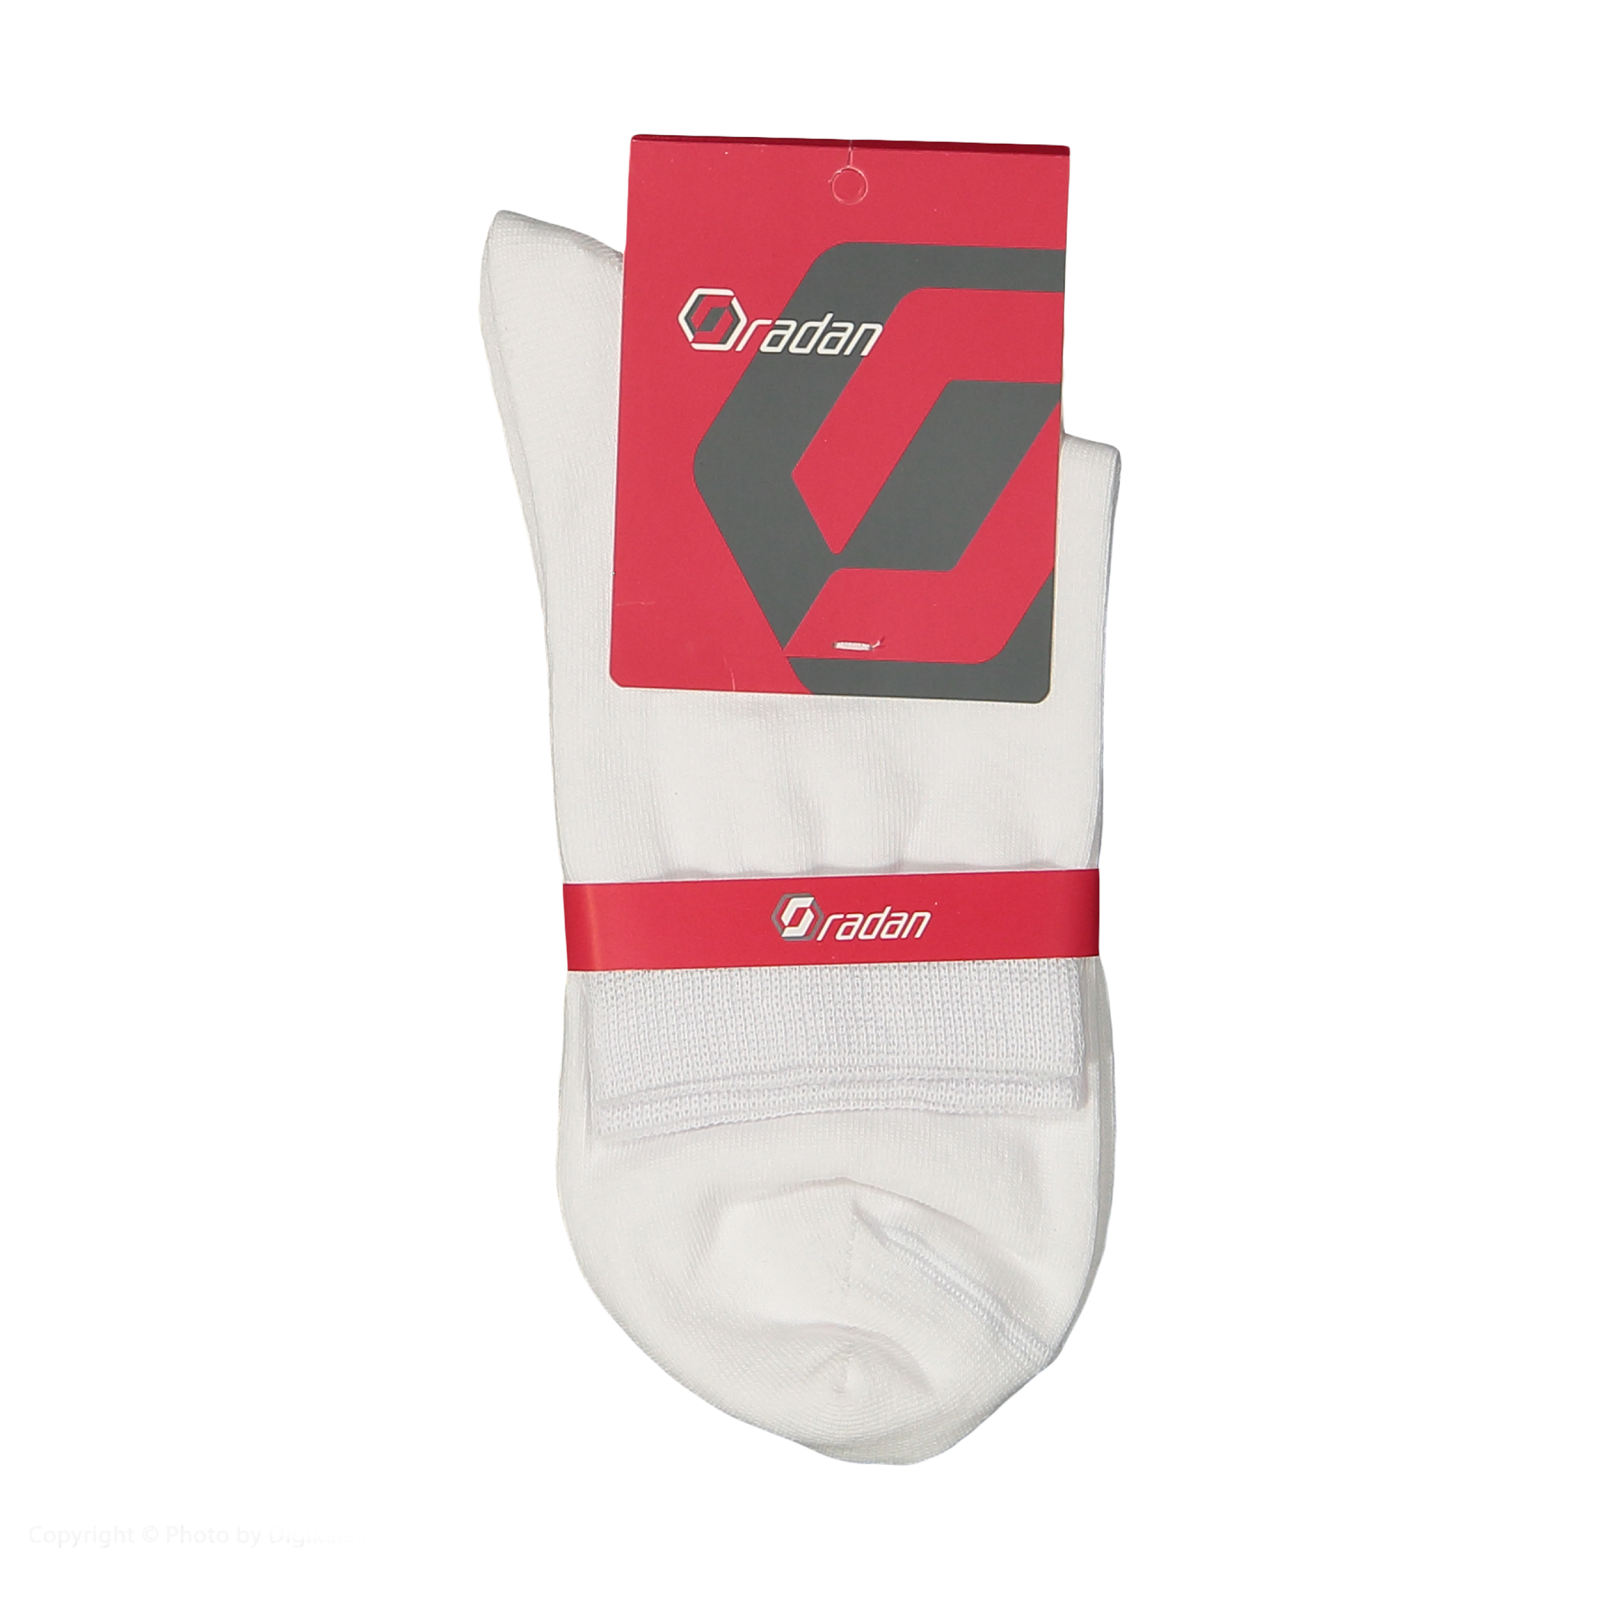 جوراب مردانه رادان کد 1001-02 -  - 2